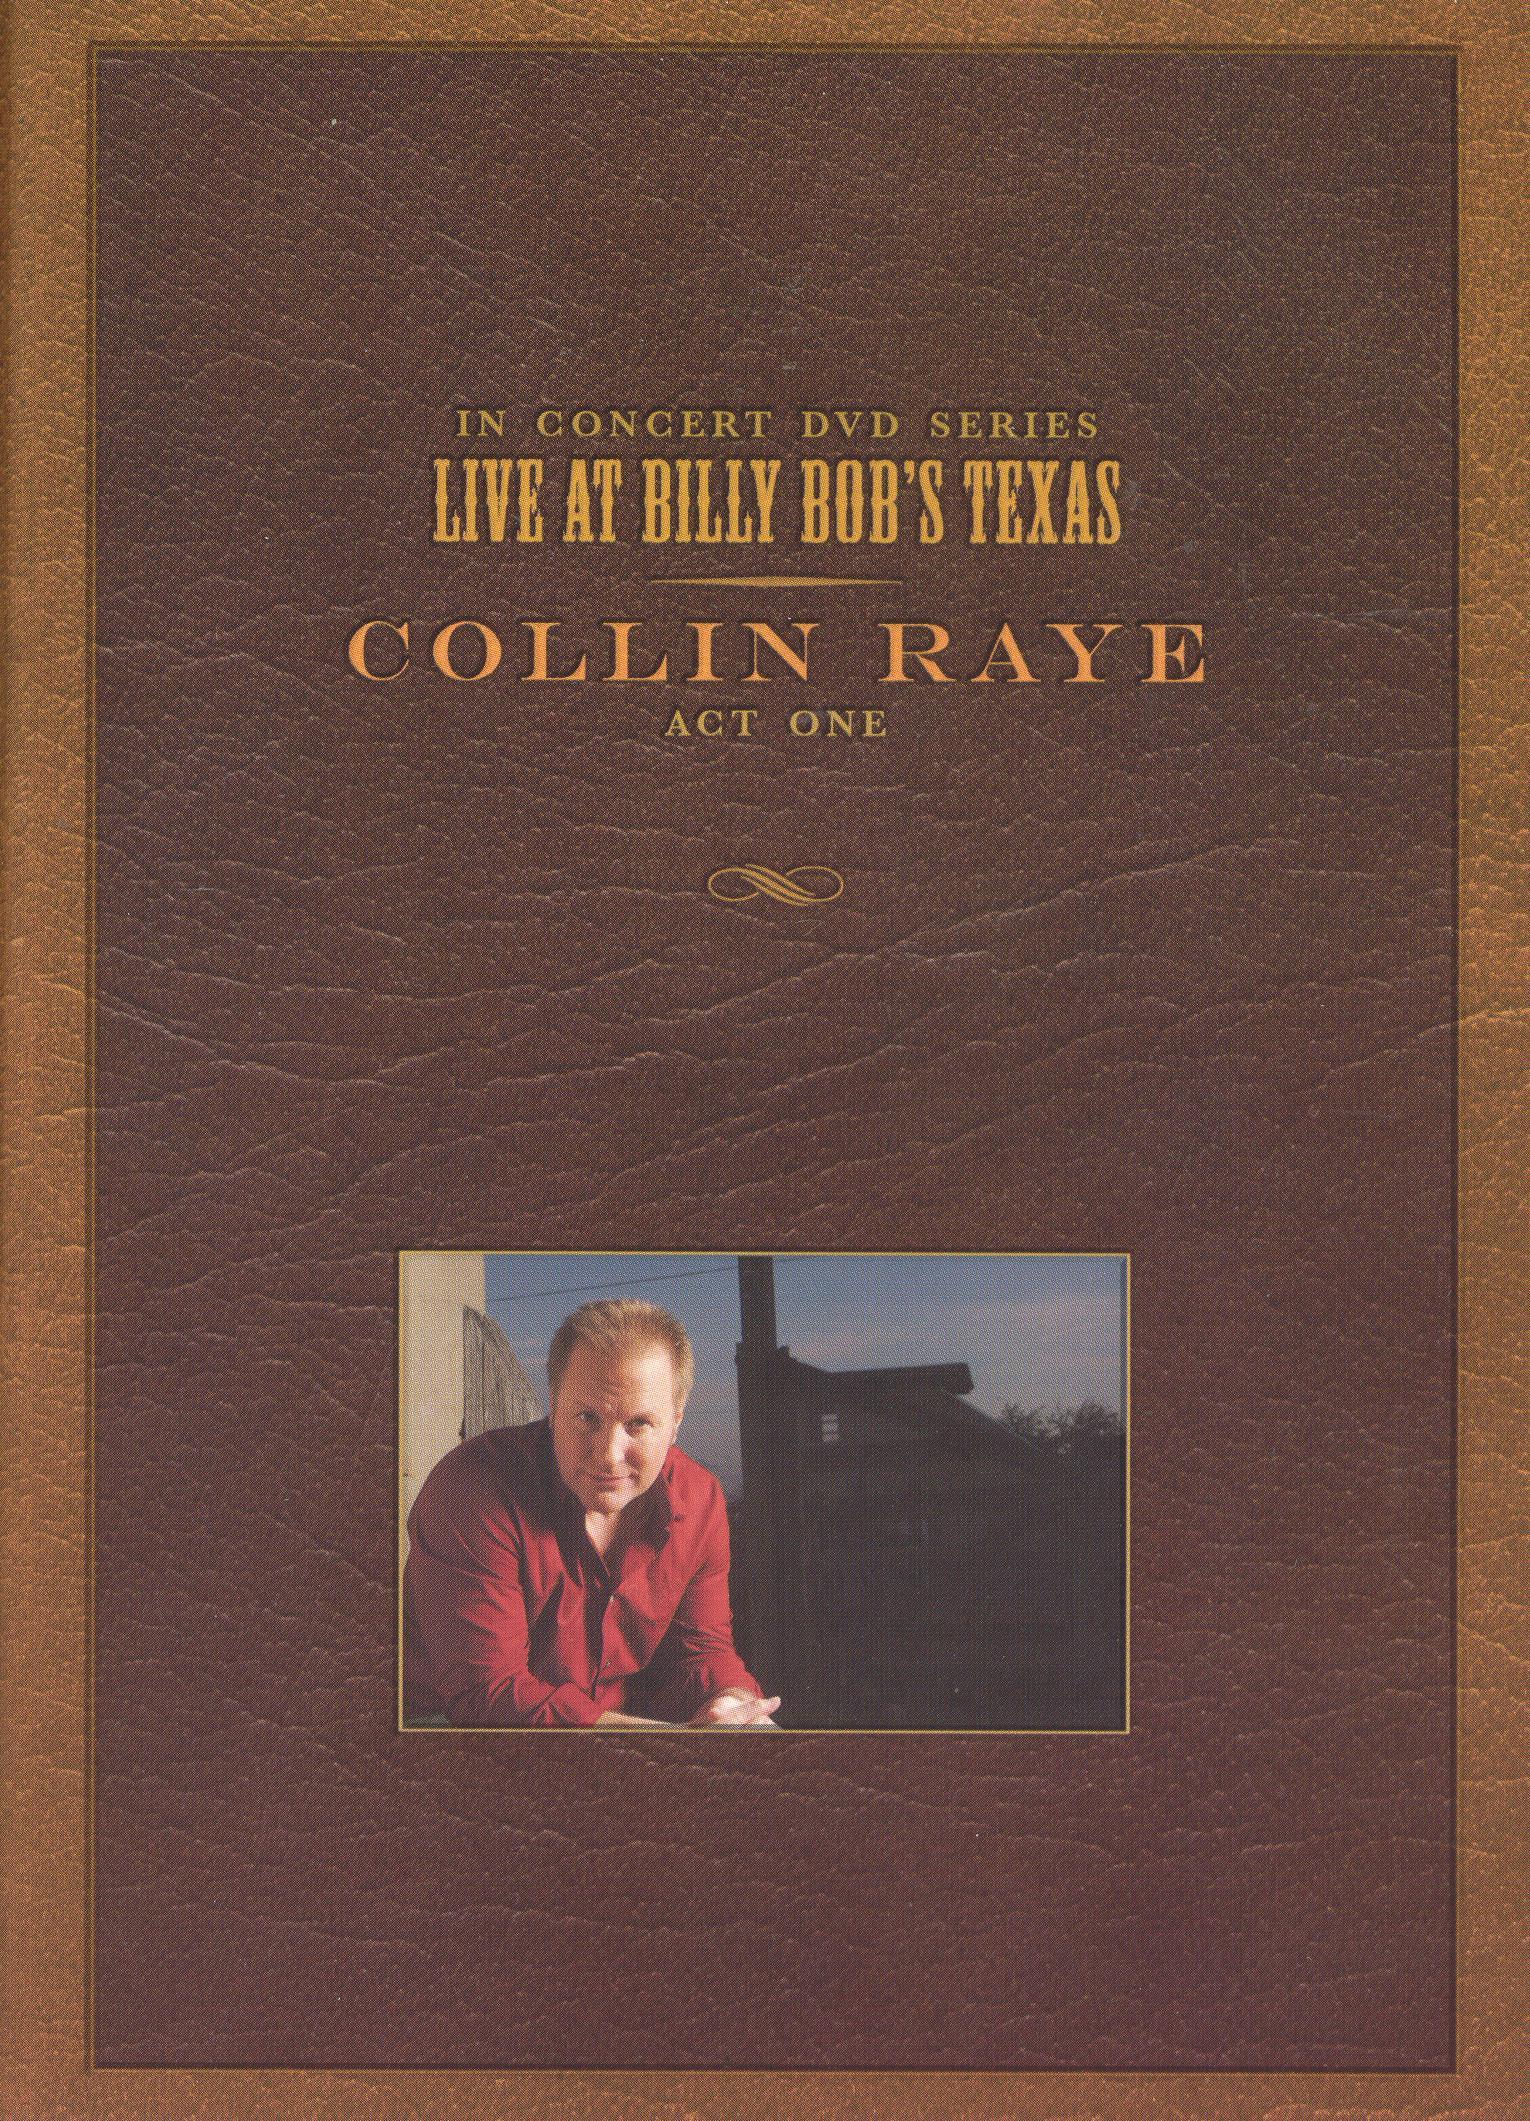 Collin Raye: Live at Billy Bob's Texas - Act One